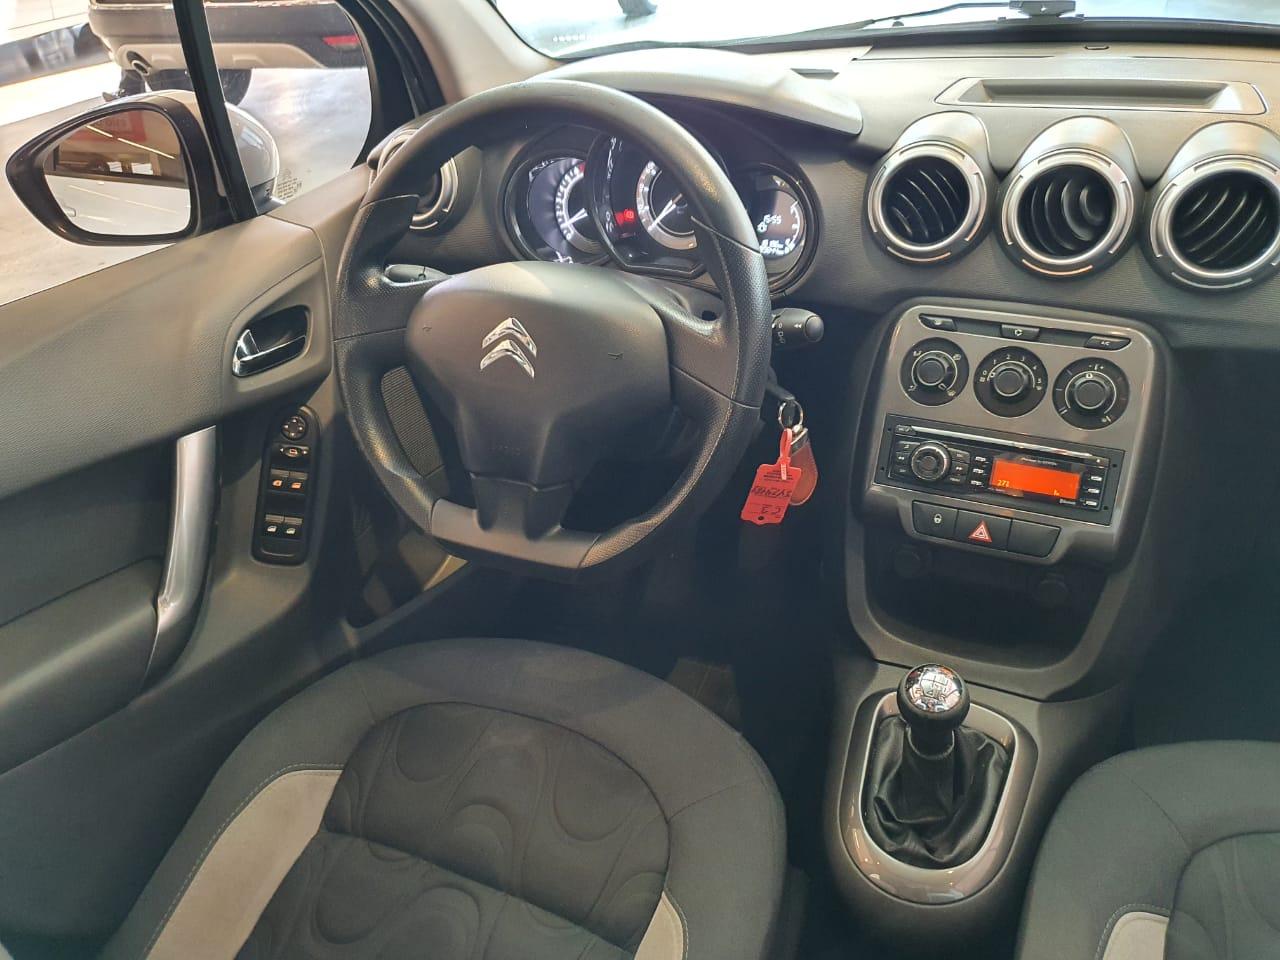 Comprar seminovo Citroën C3 Tendance 1.5 Flex 8V 5p Mec. no Certificados Zensul